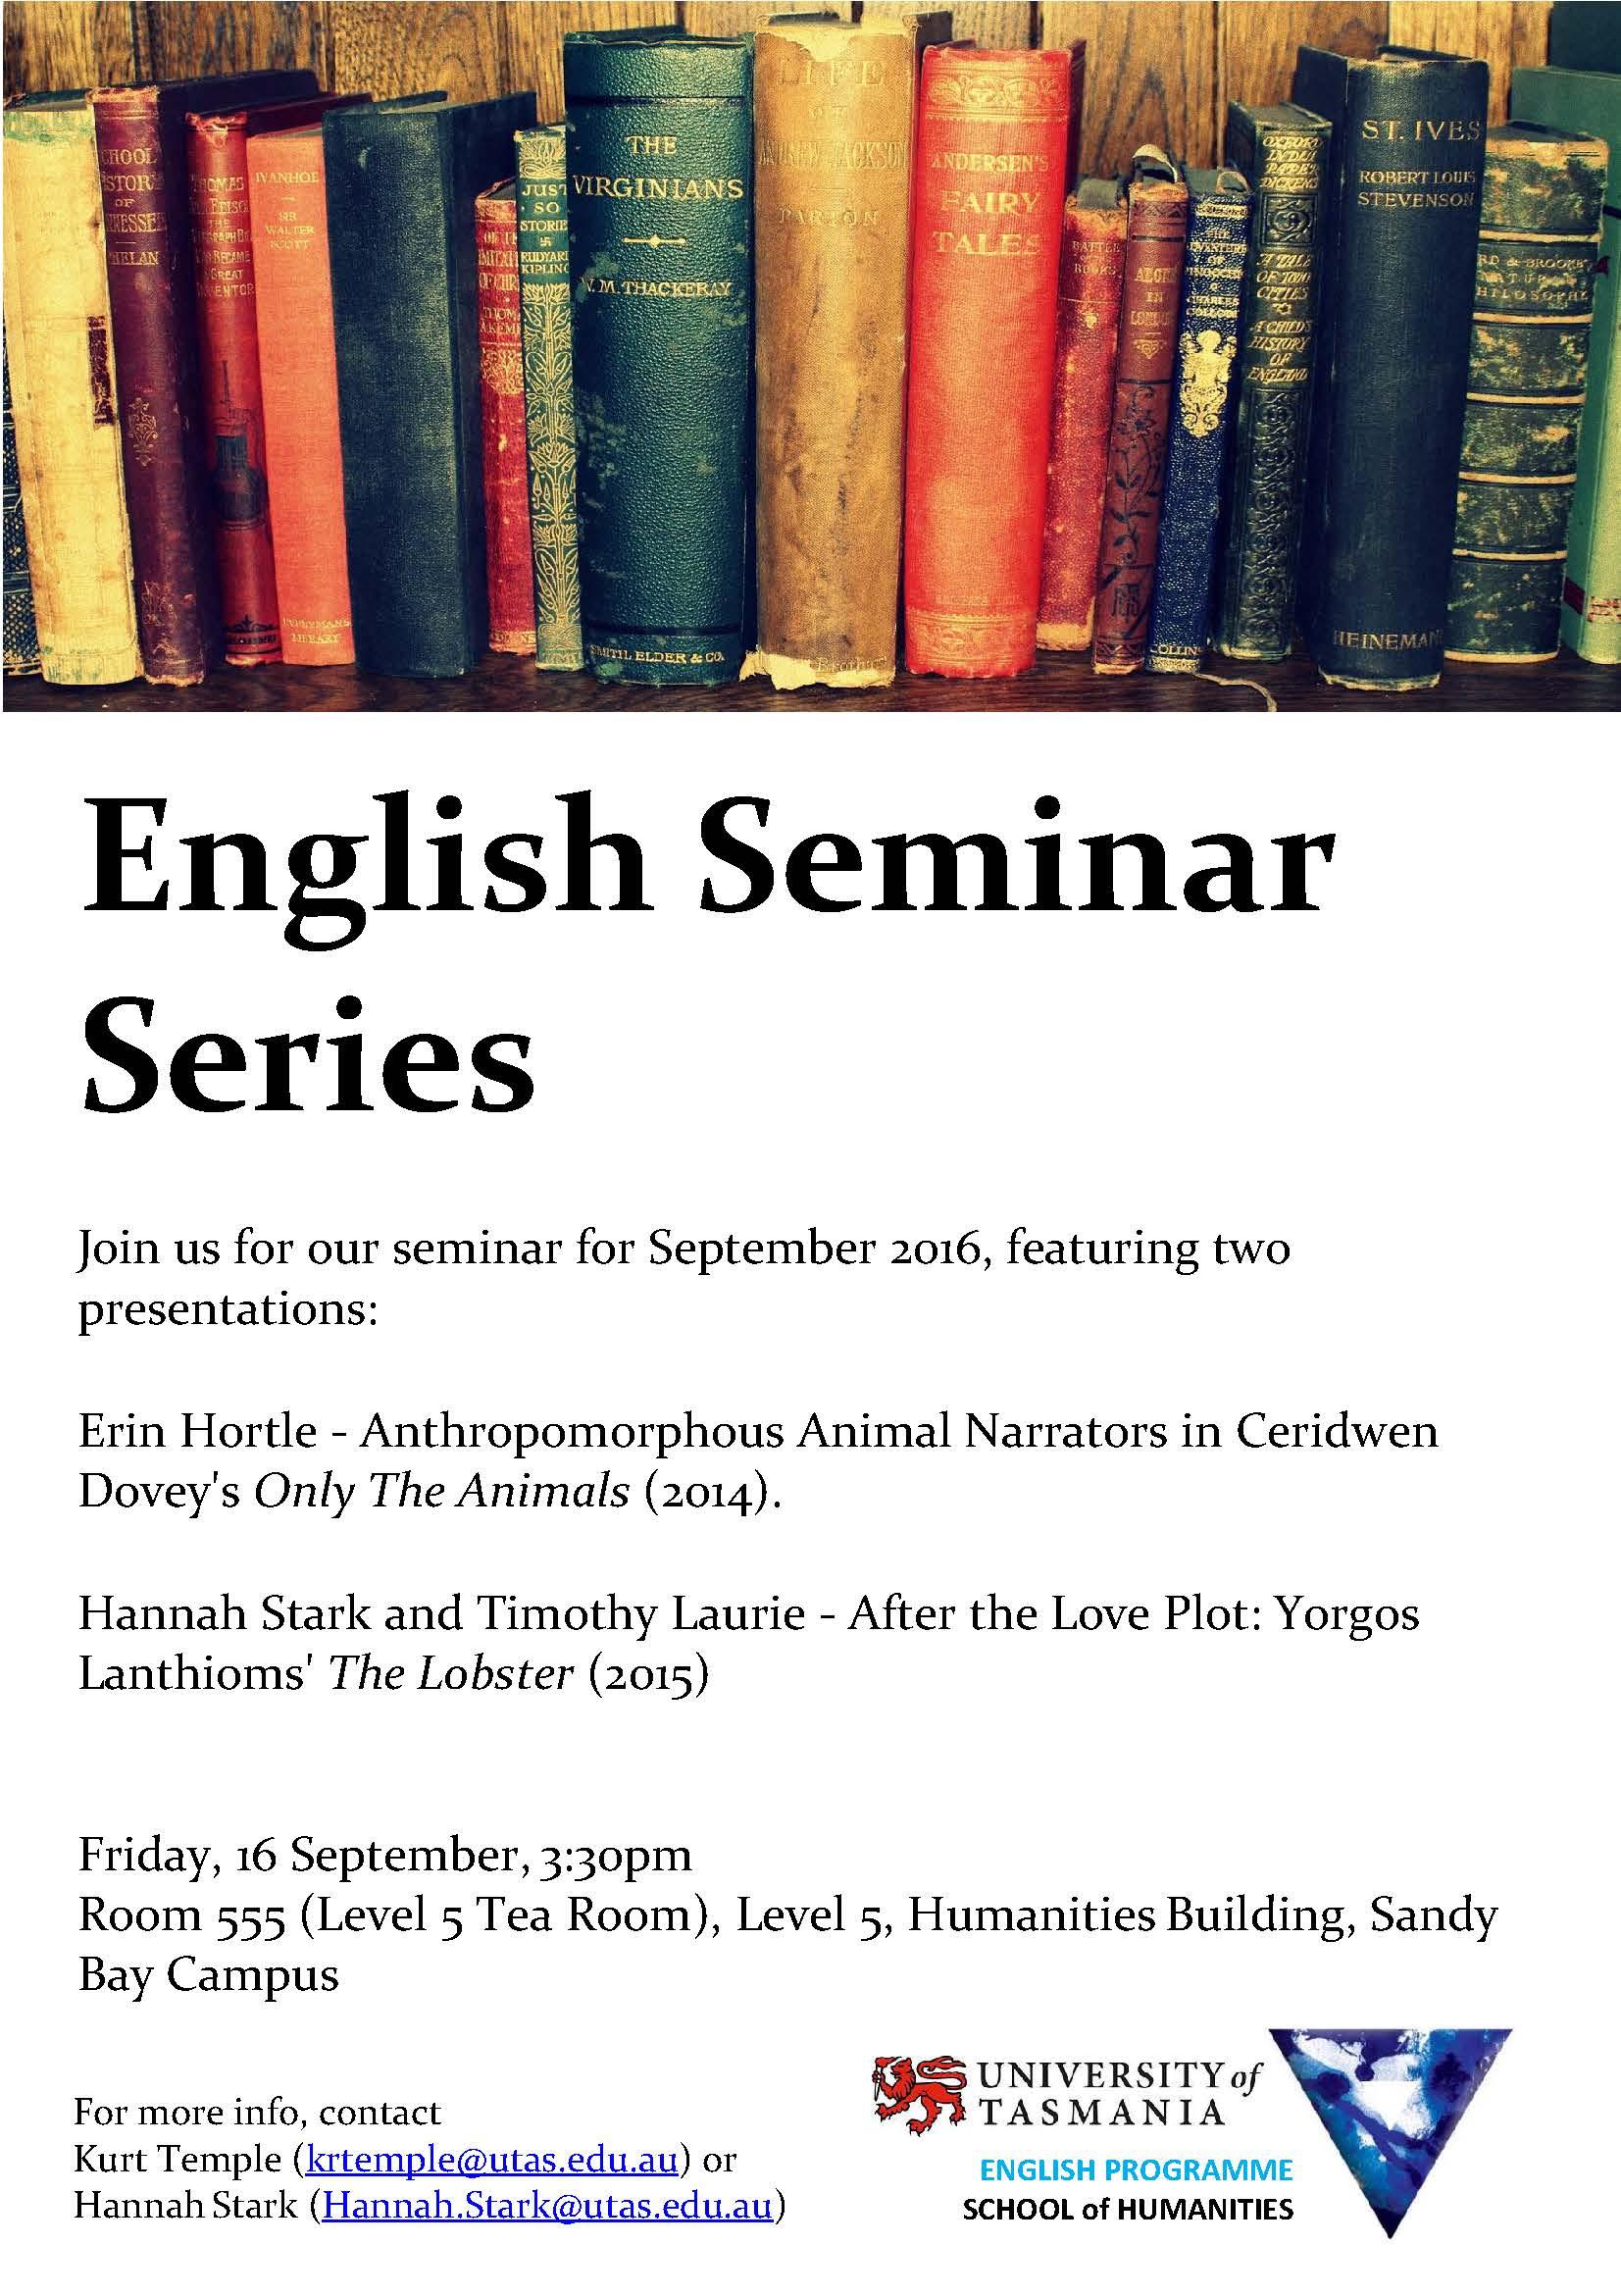 English Seminar Series 16 Sep